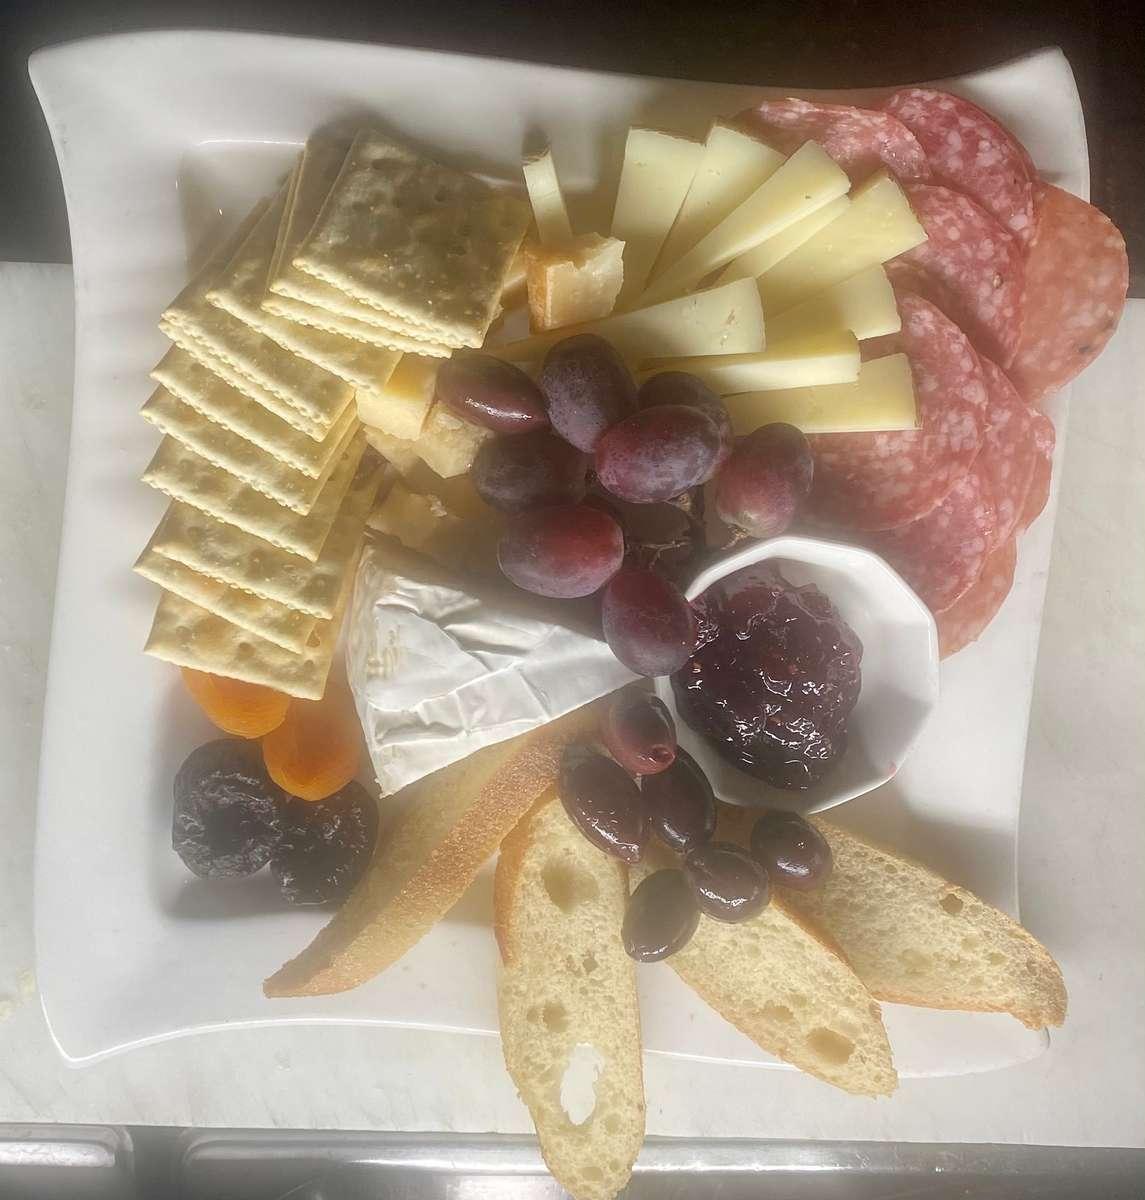 Mediterranean Cheese and Salumi plate